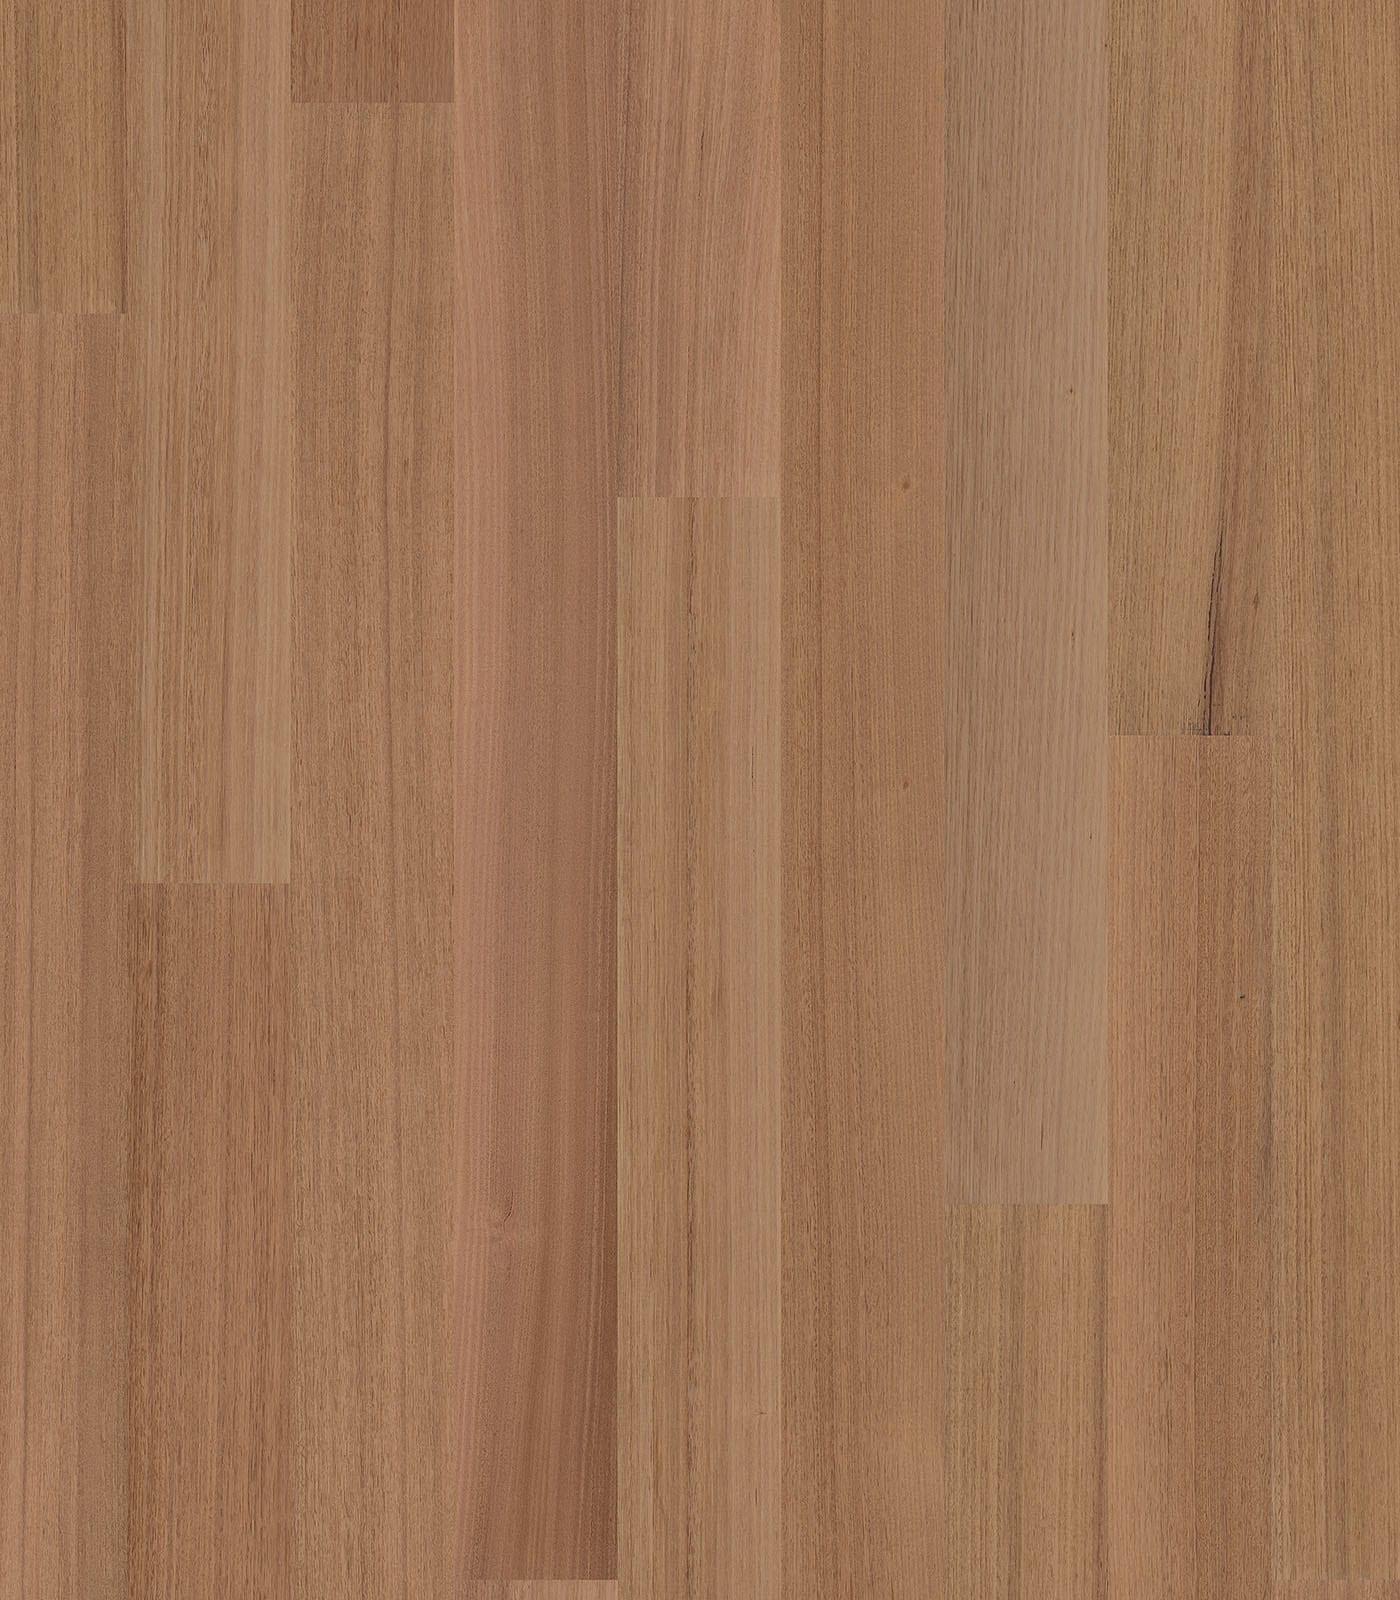 Melbourne-After Oak Collection-Tasmanian Oak Floors-flat